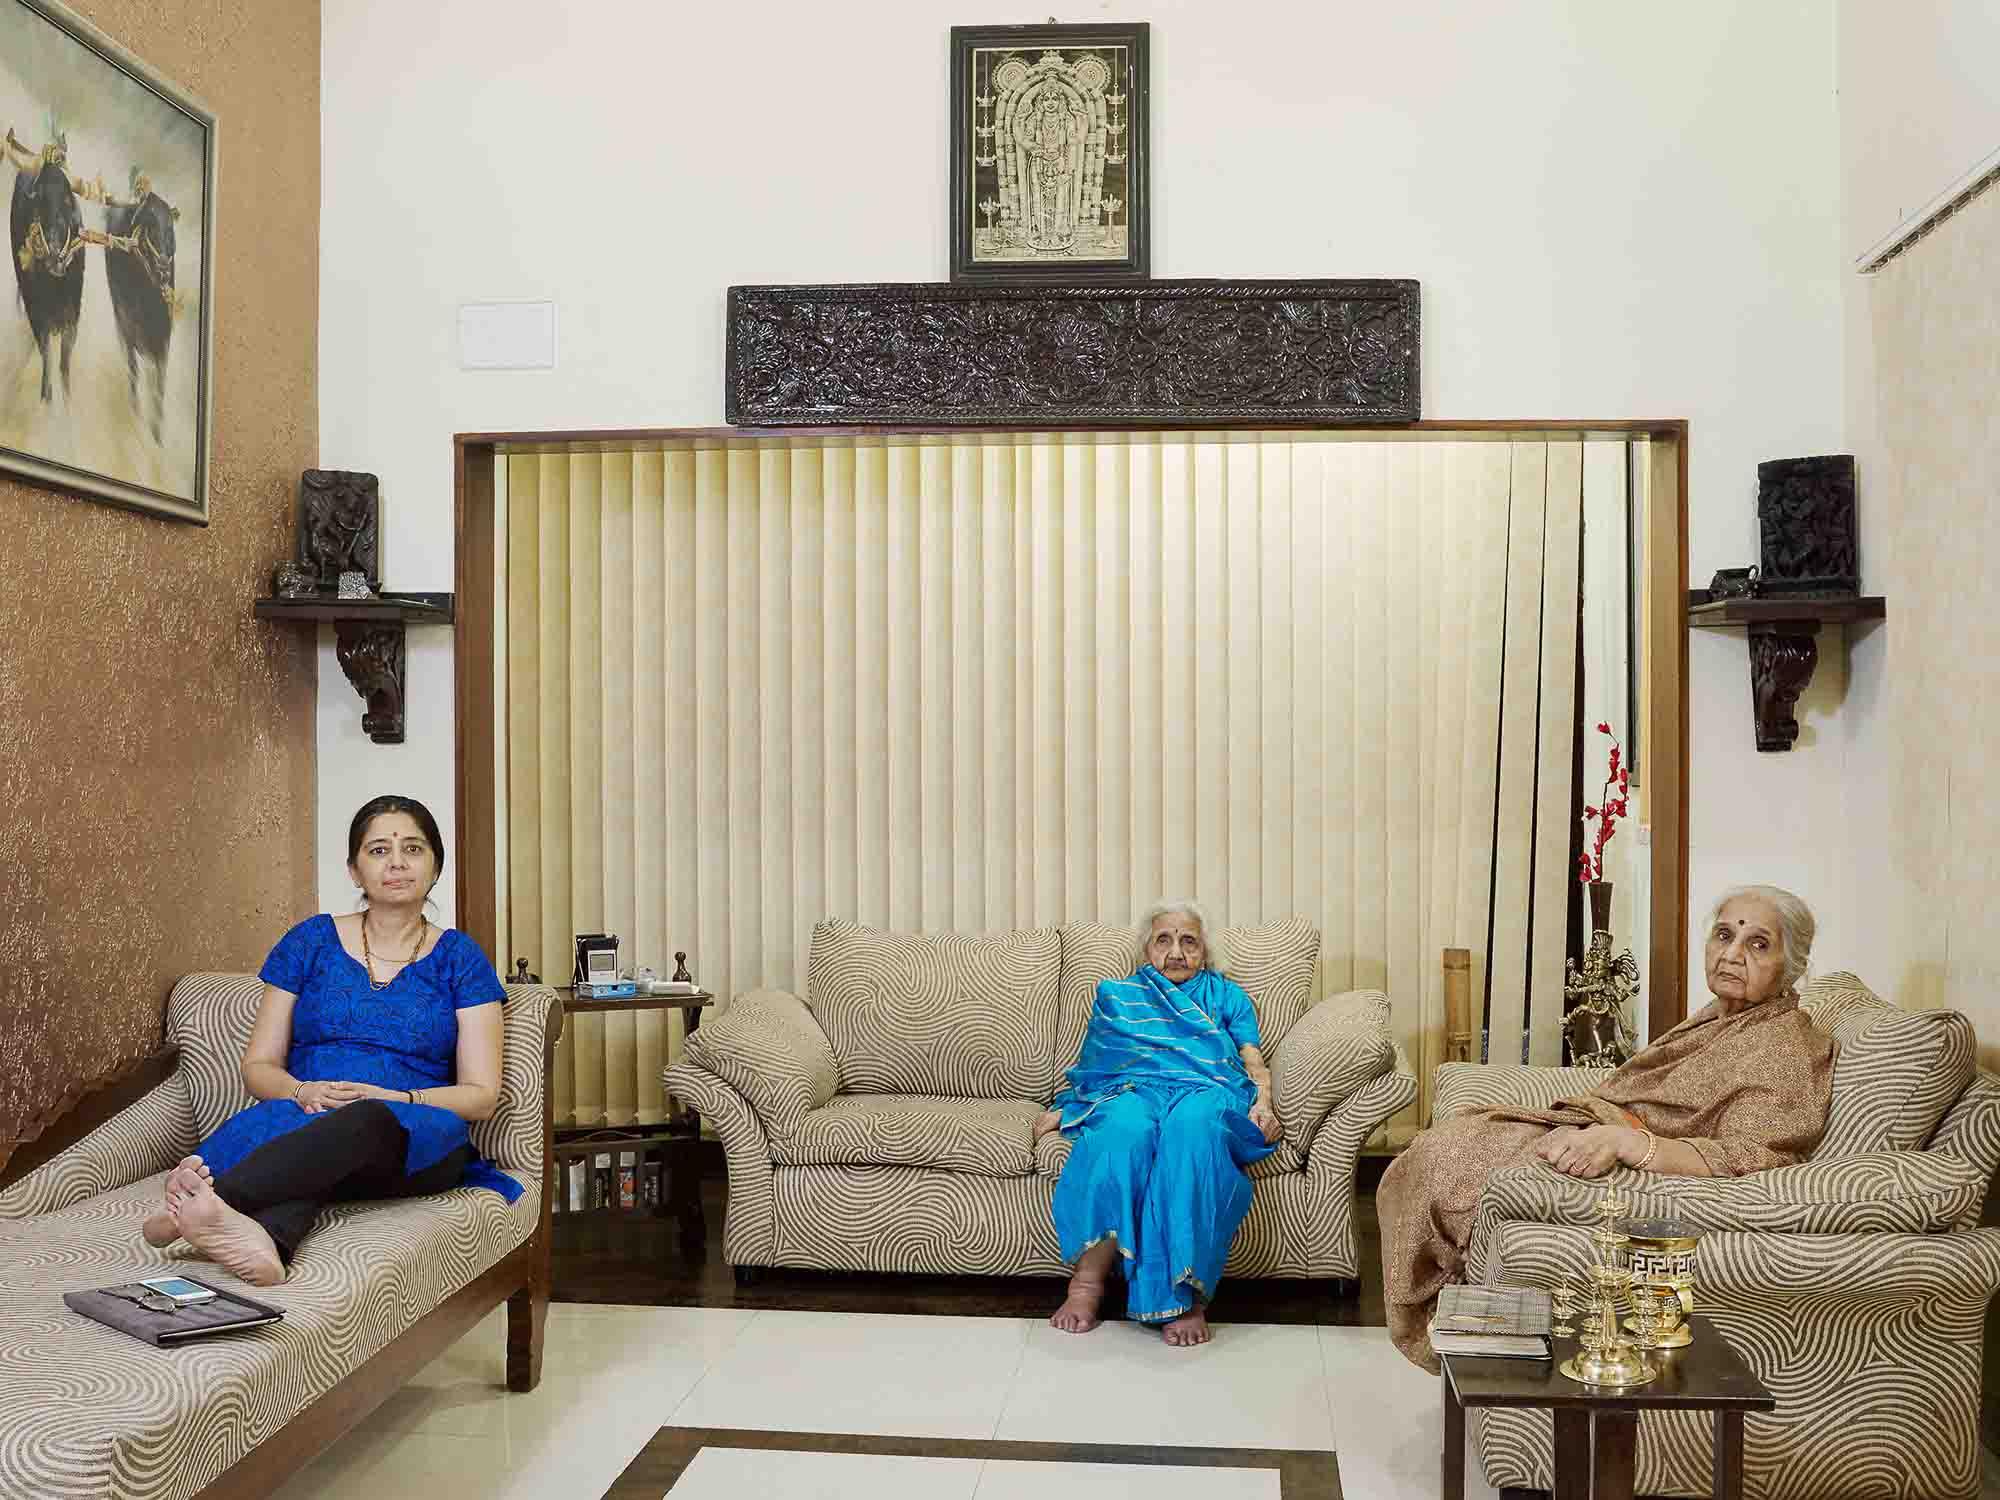 Nora Bibel, Setlur, Bangalore, Indien, 2015. Aus der Serie Family Comes First